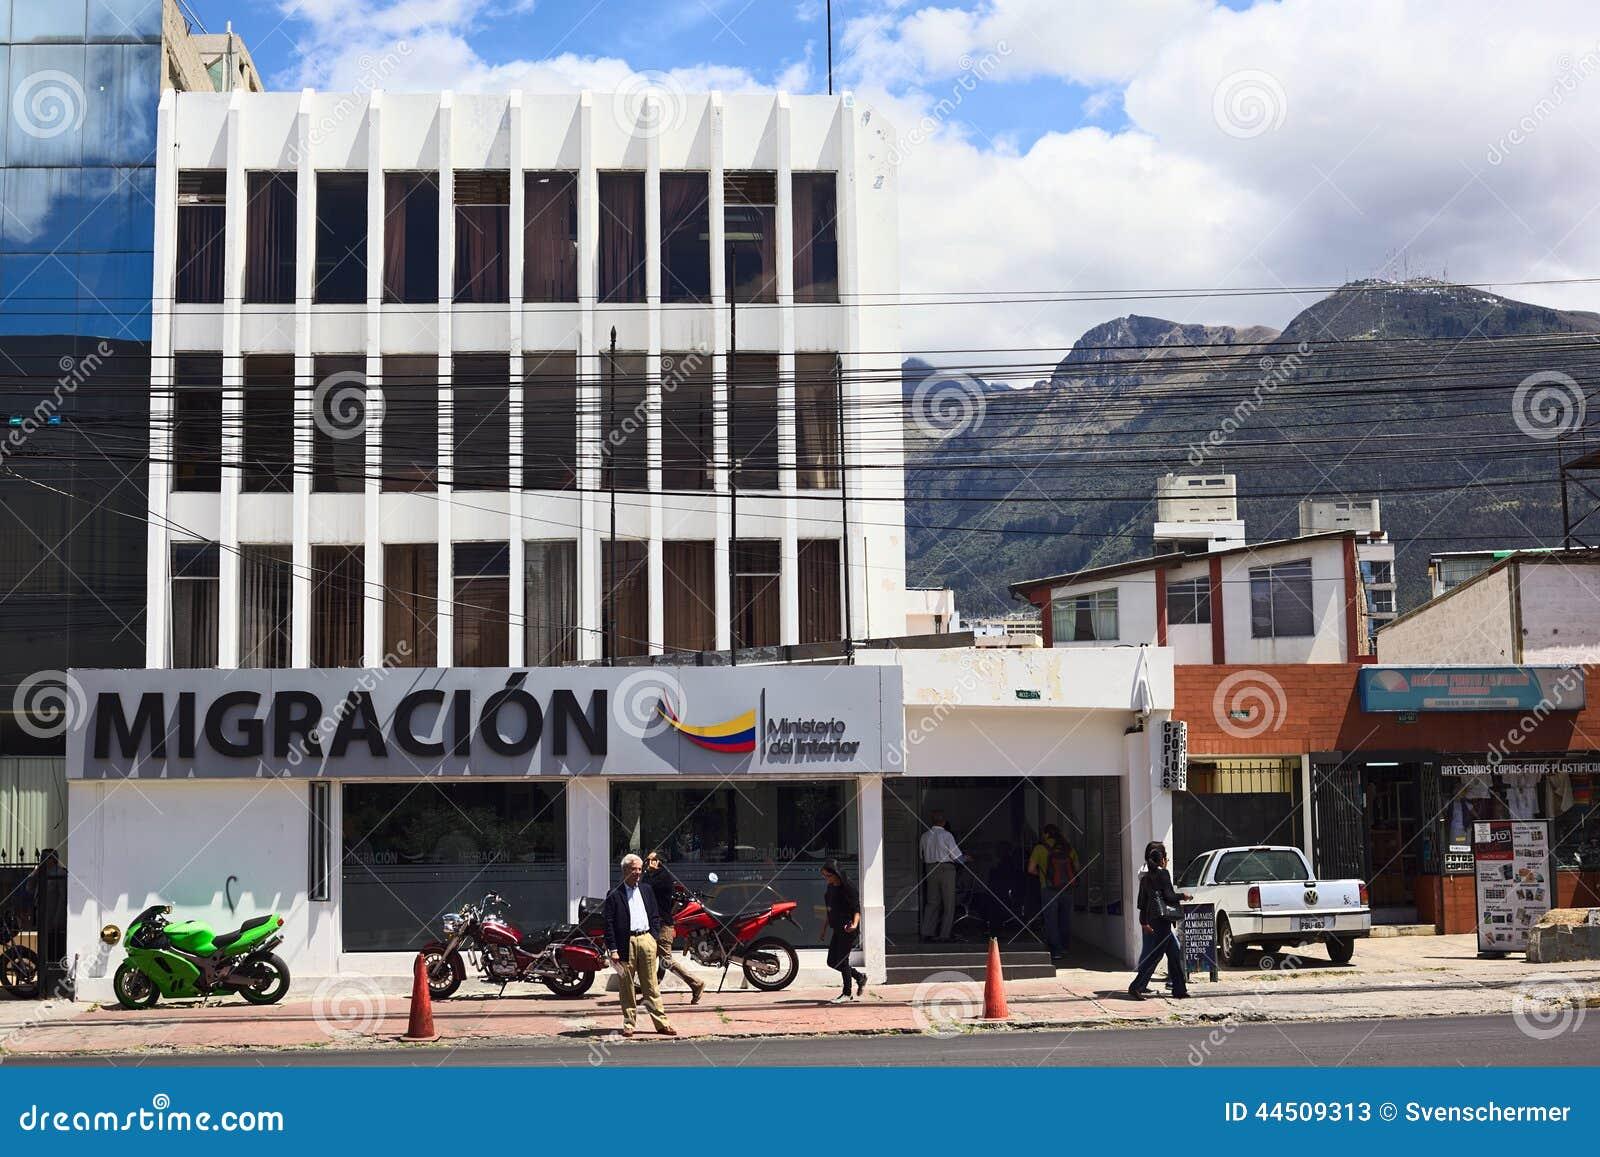 Migration office building in quito ecuador editorial for Office design quito